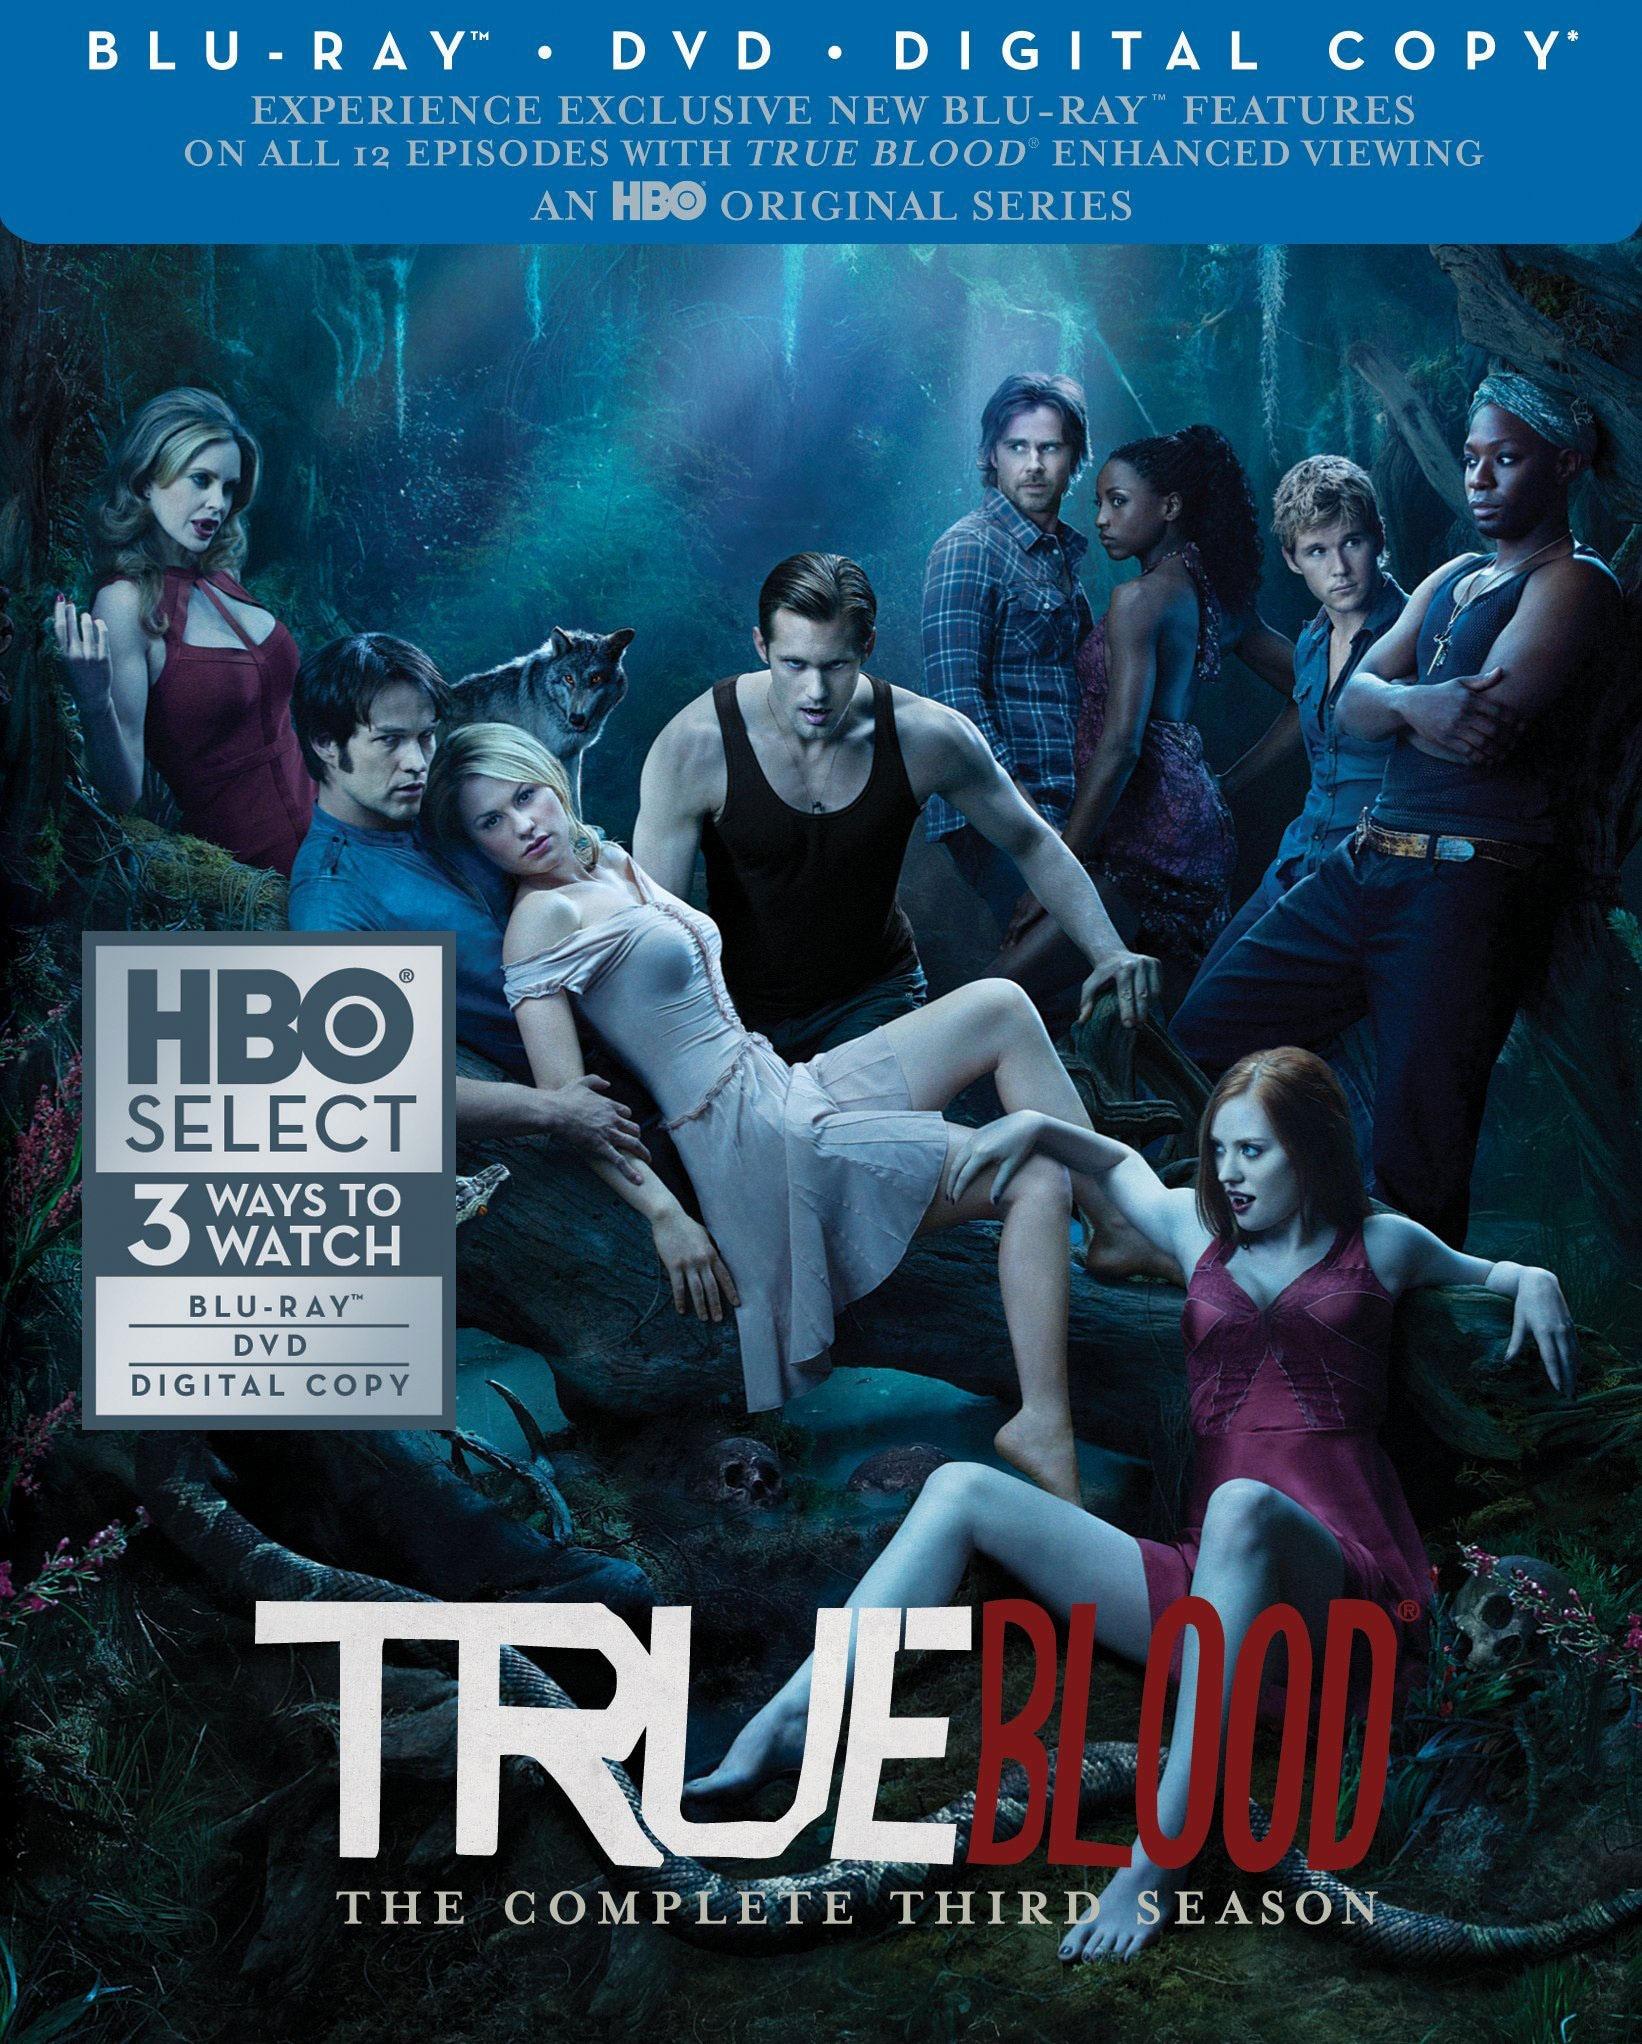 True Blood: The Complete Third Season (Blu-ray Disc)